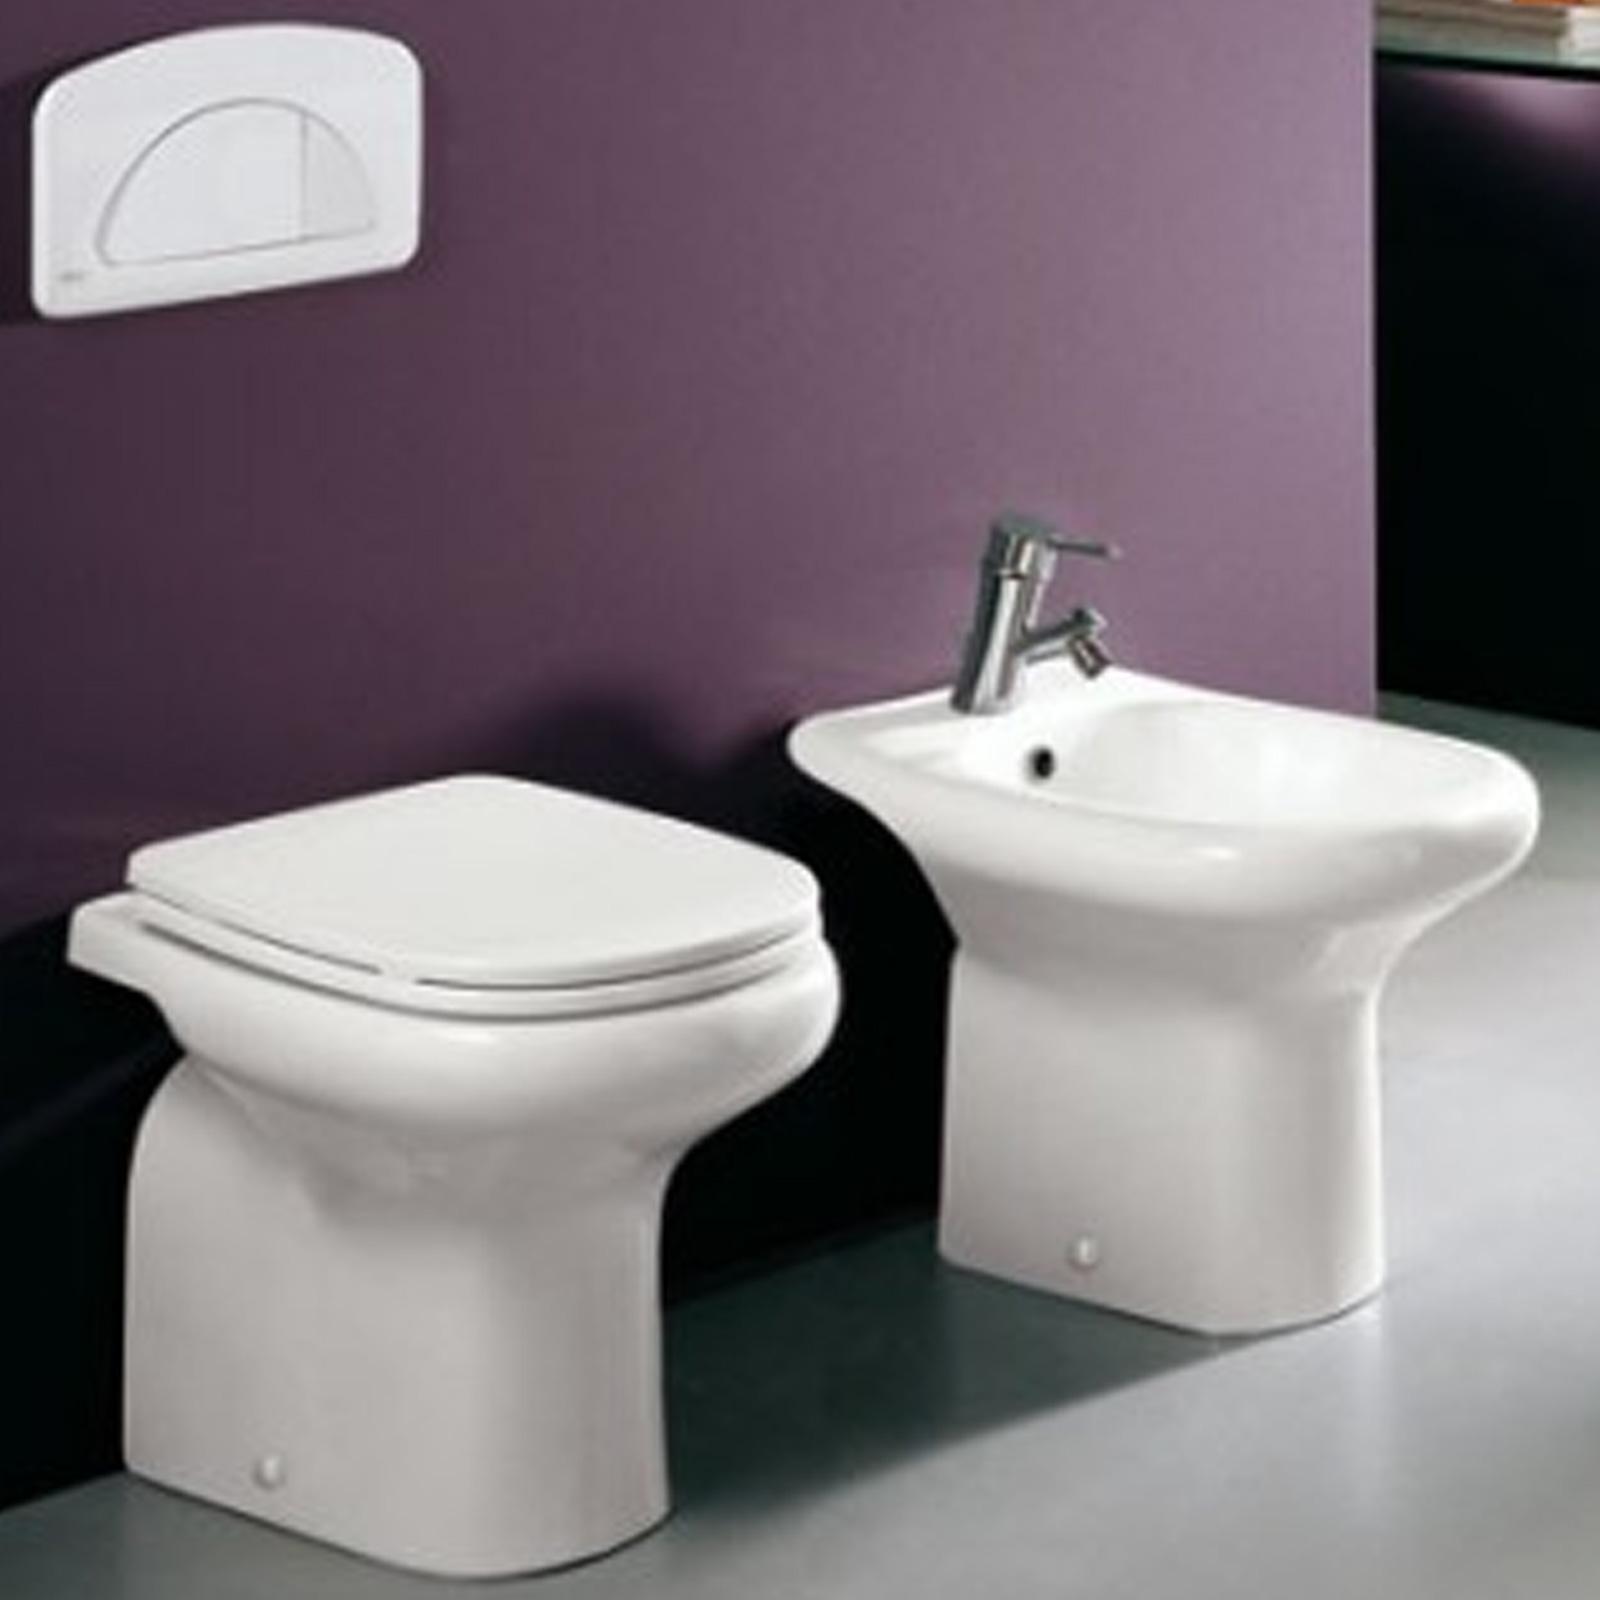 3 sanitari tradizionali wc bidet sedile - Bagno sanitari prezzi ...